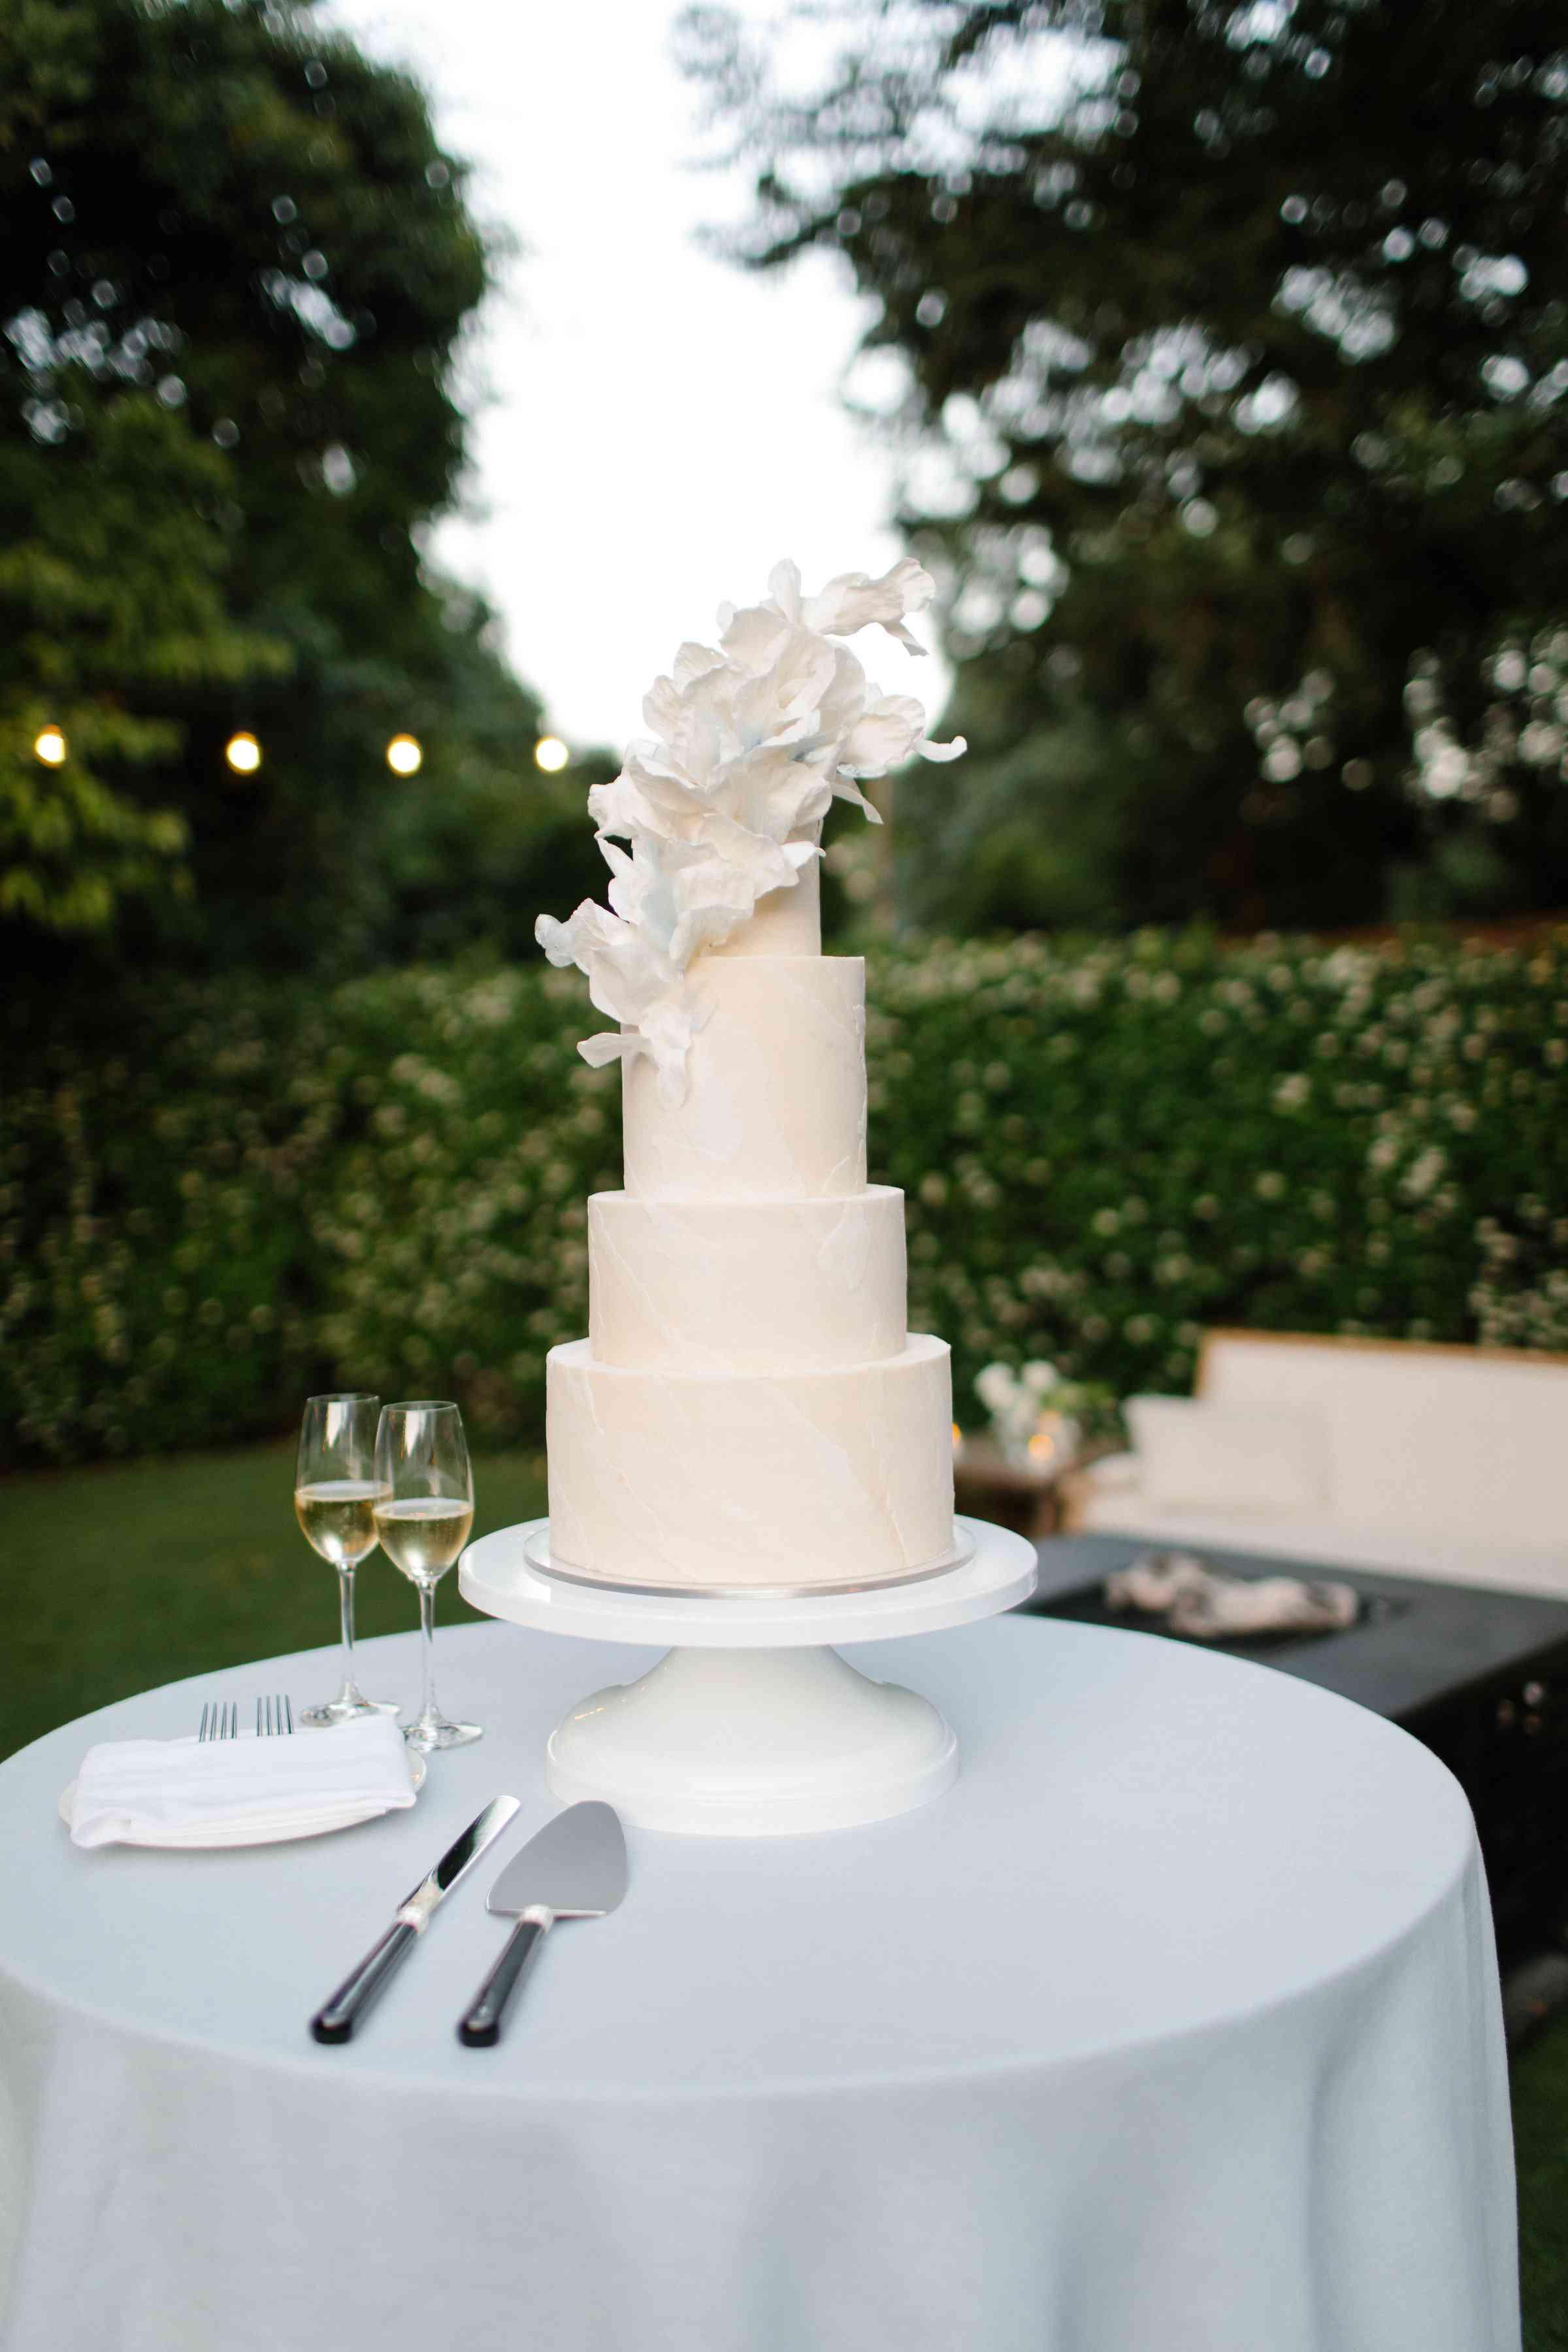 <p>four-tier white wedding cake</p><br><br>